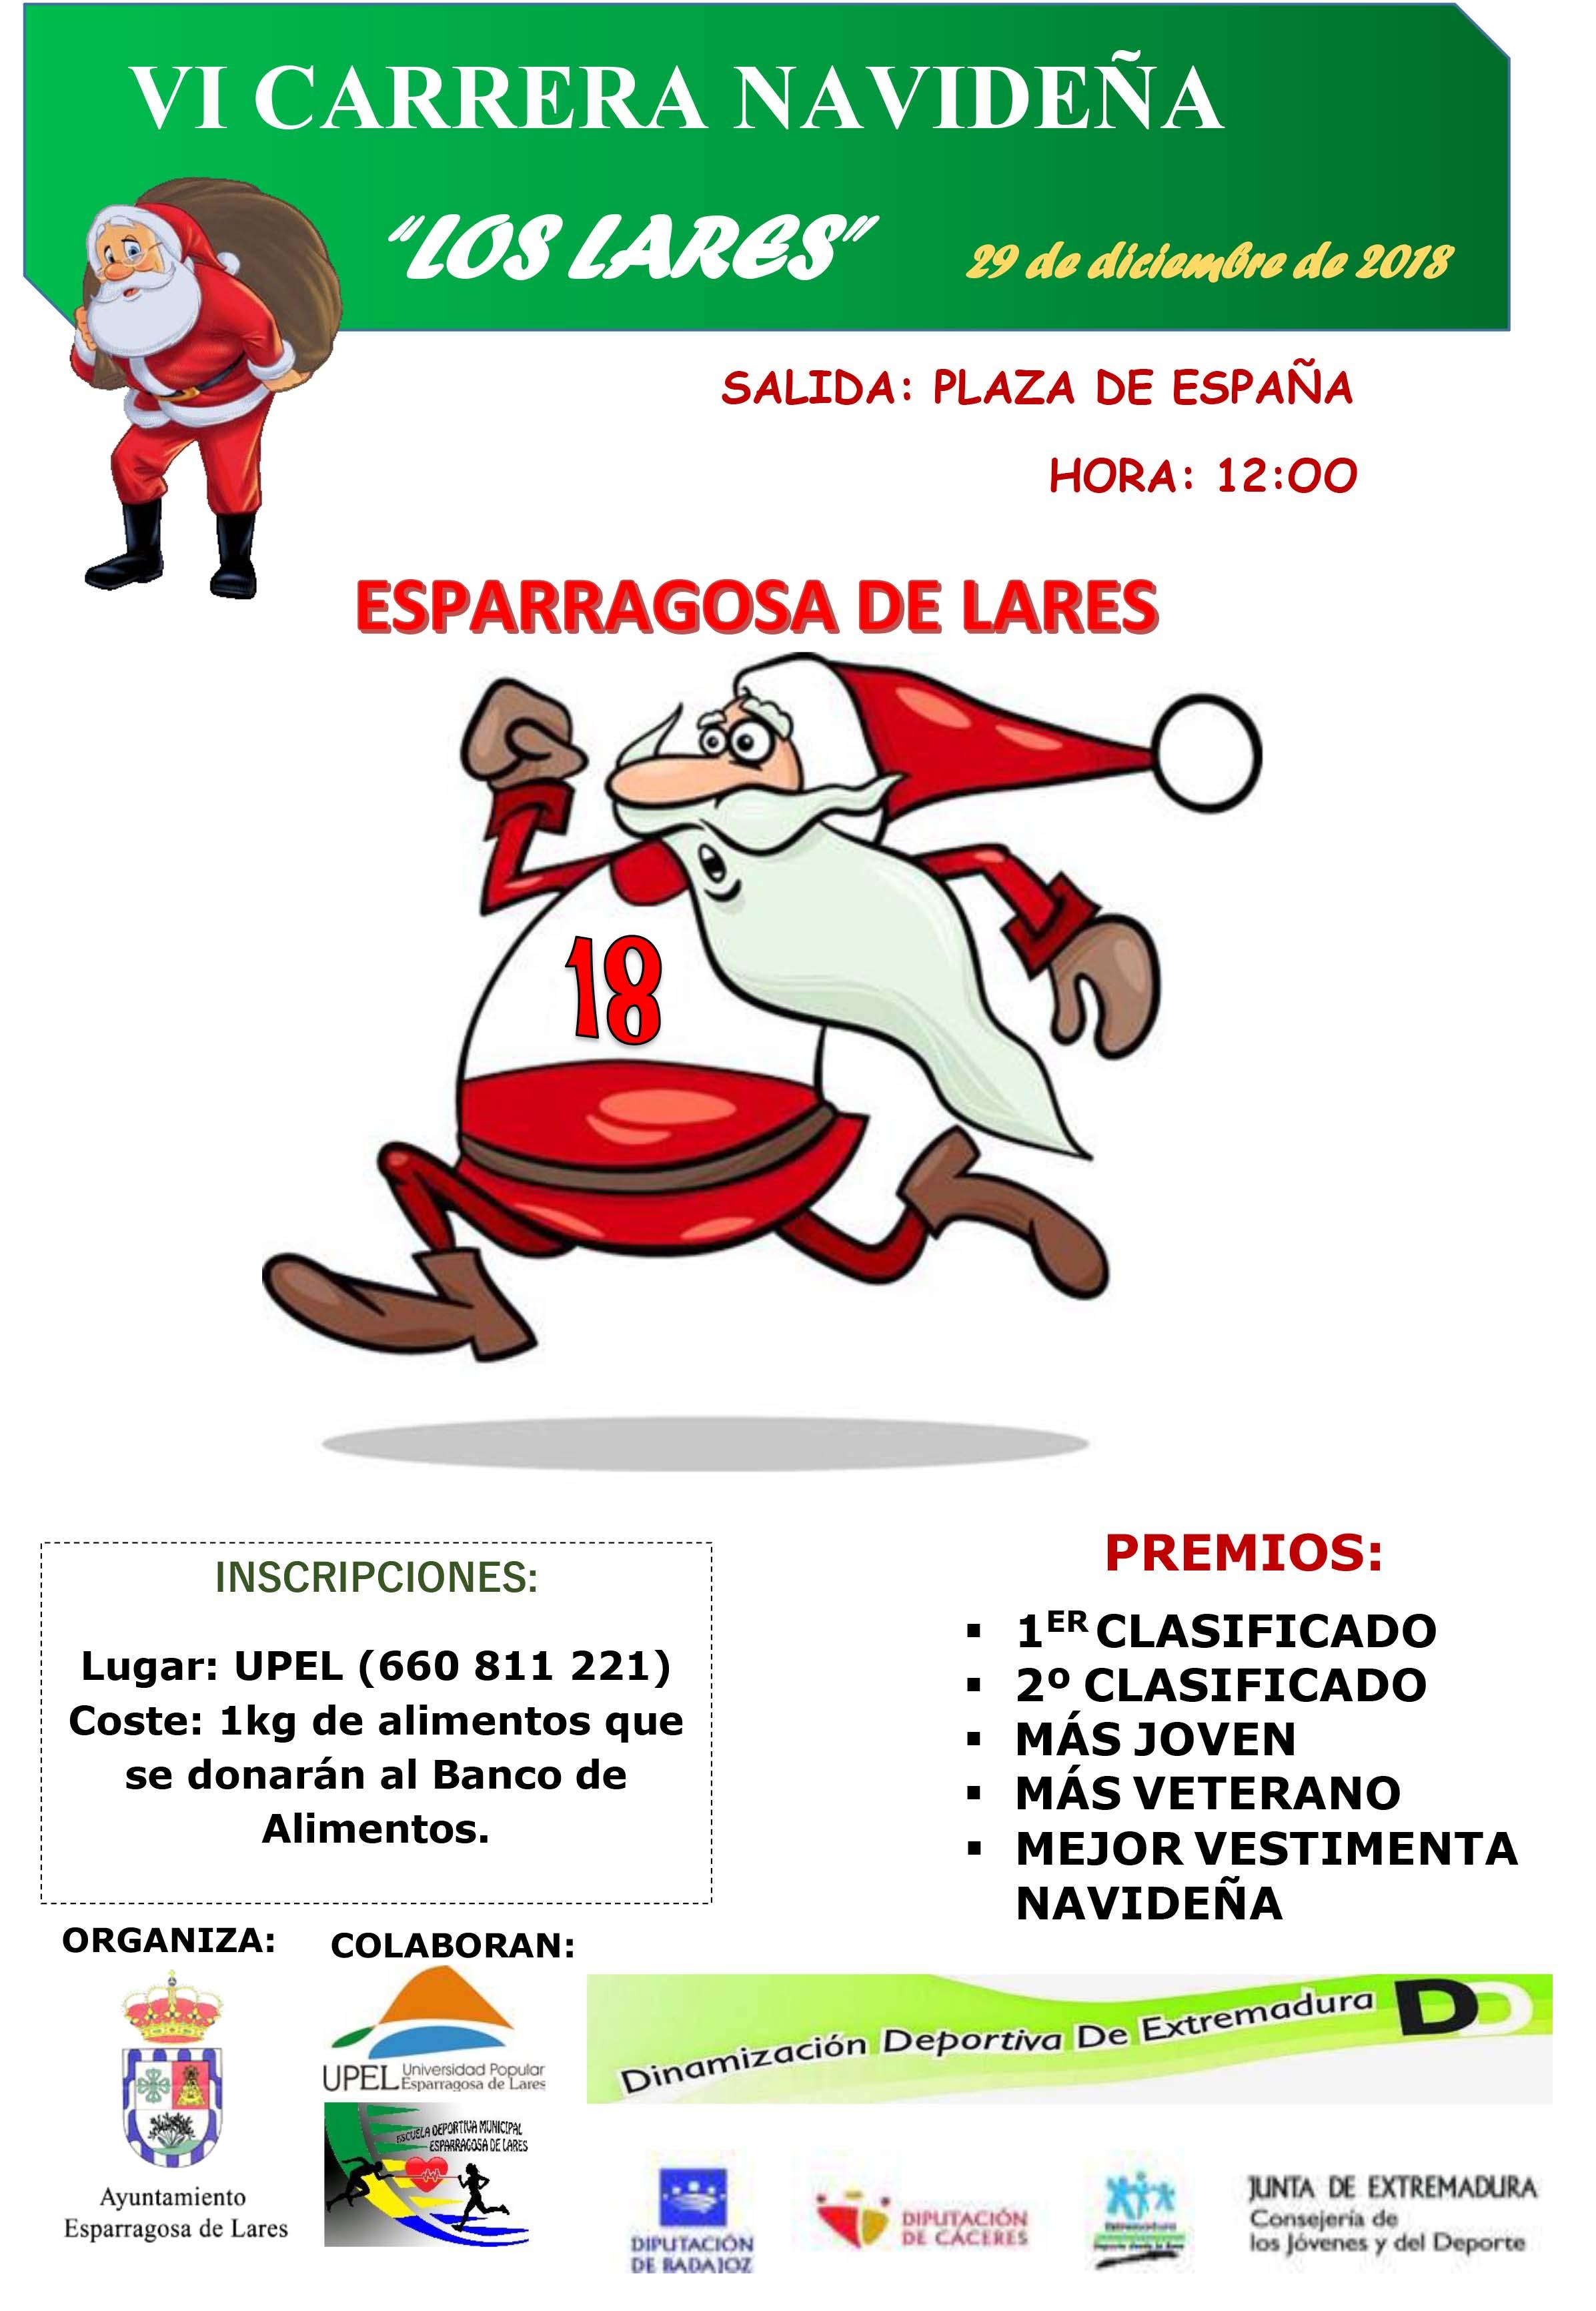 VI Carrera navideña - Esparragosa de Lares (Badajoz)